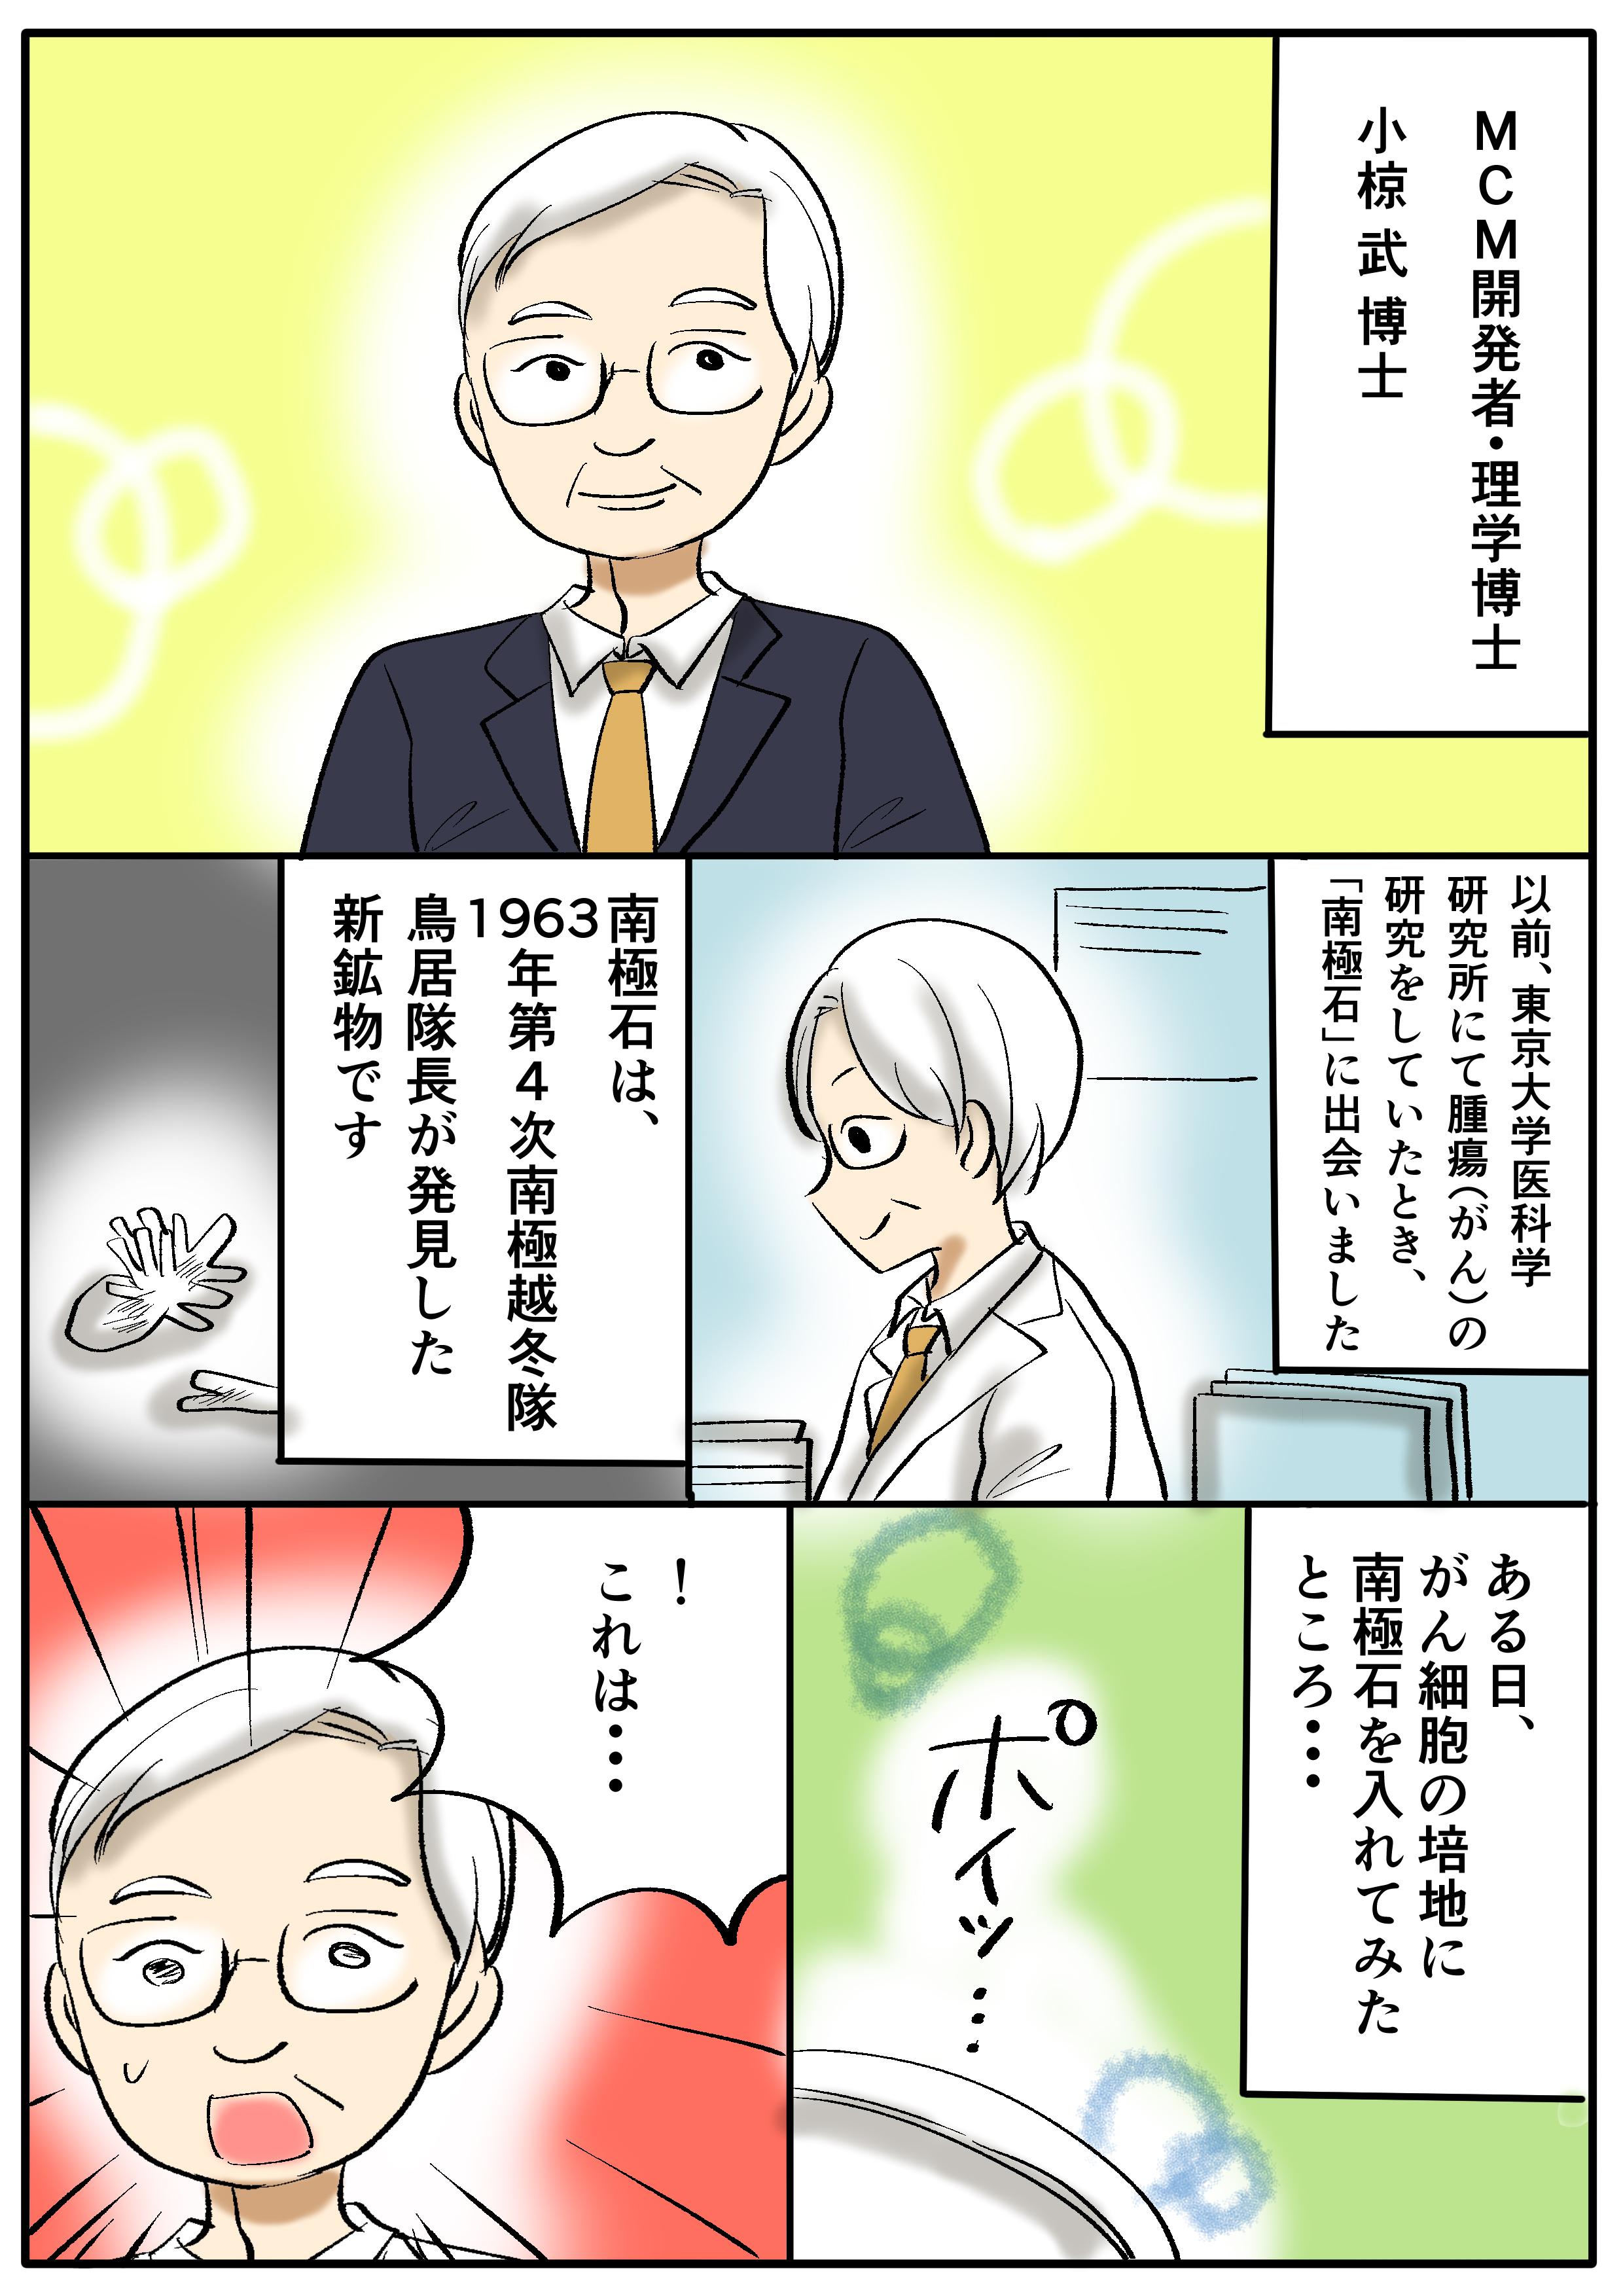 MCM漫画1